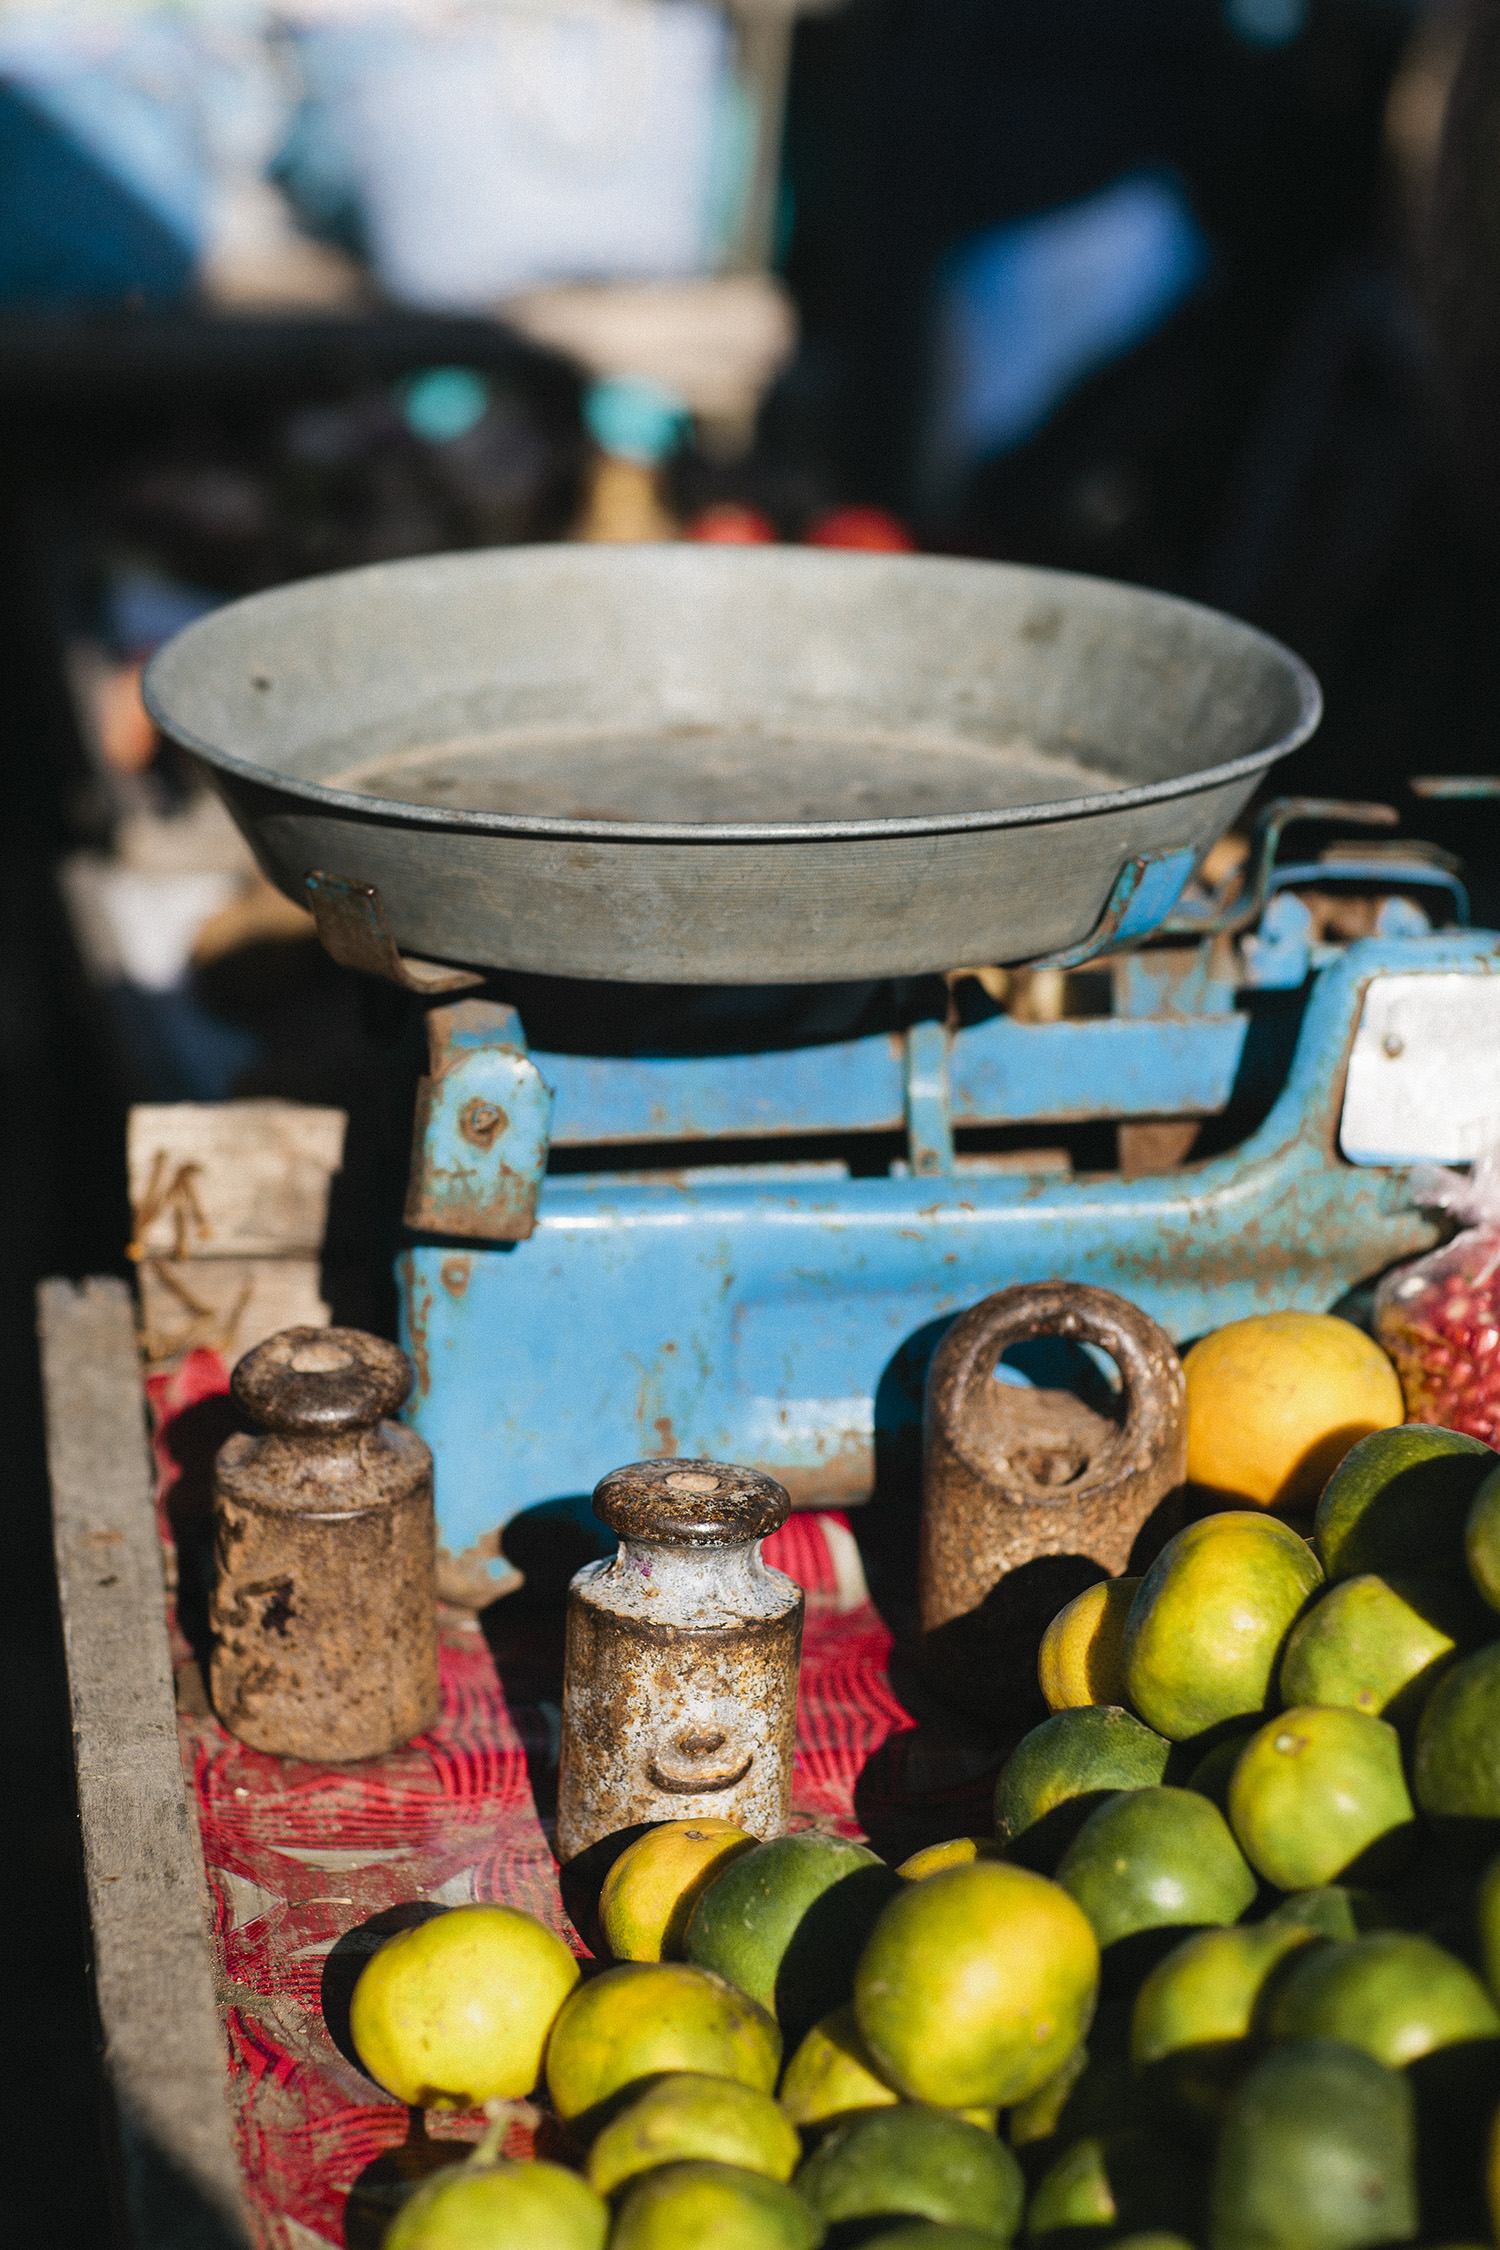 lifestyle-editorial-travel-washington-dc-malek-naz-photography-limes-shomal-iran-bazaar.jpg